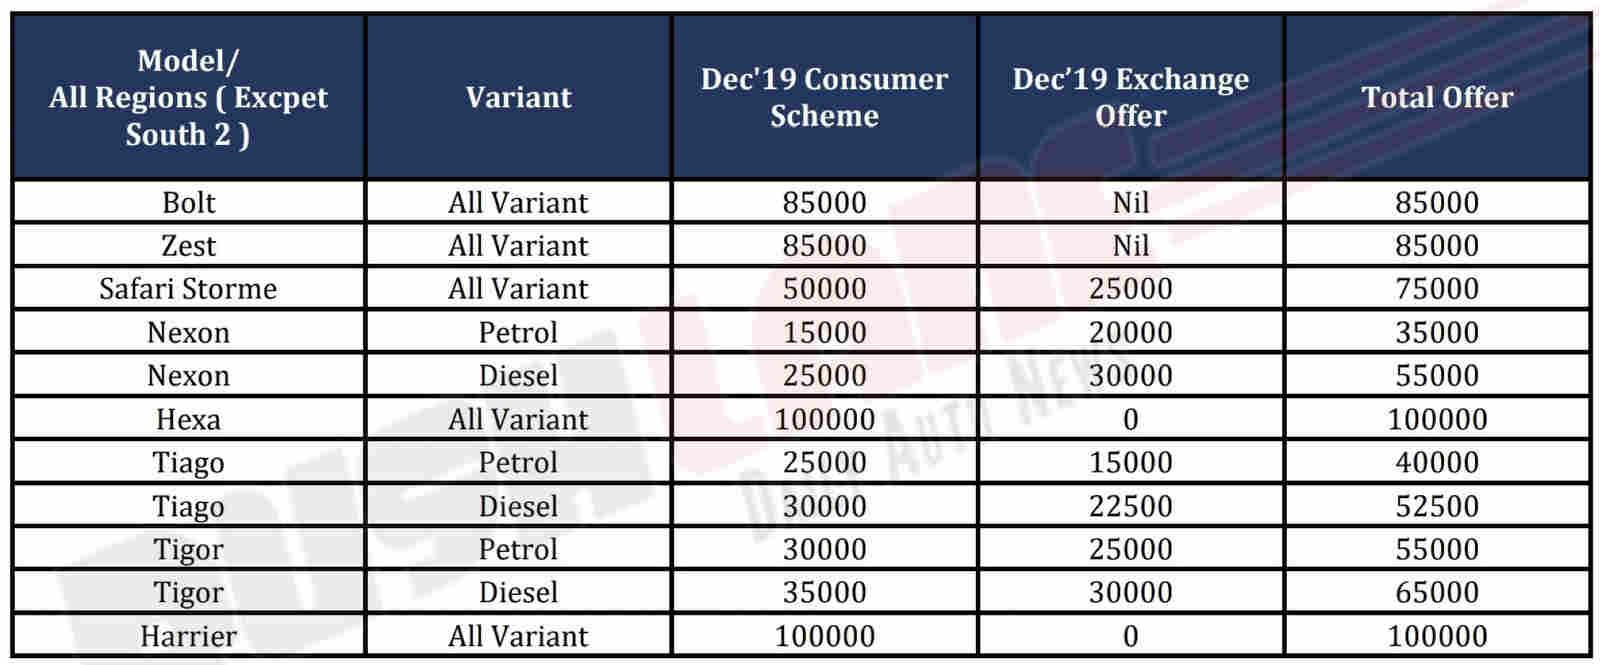 Tata discount offers Dec 2019